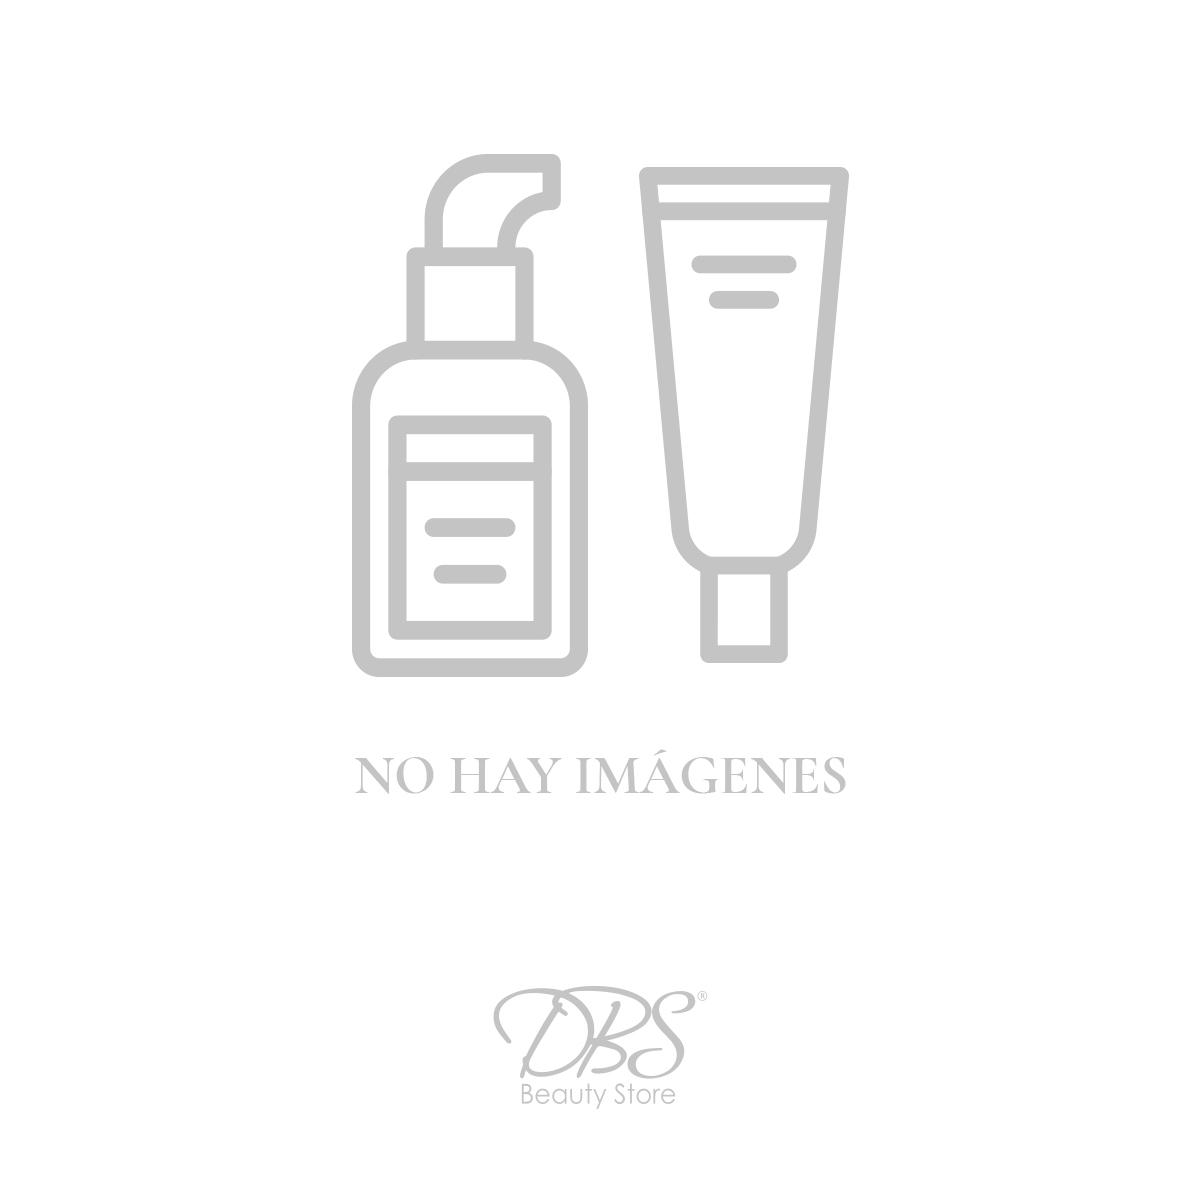 Base De Maquillaje Conceal & Define